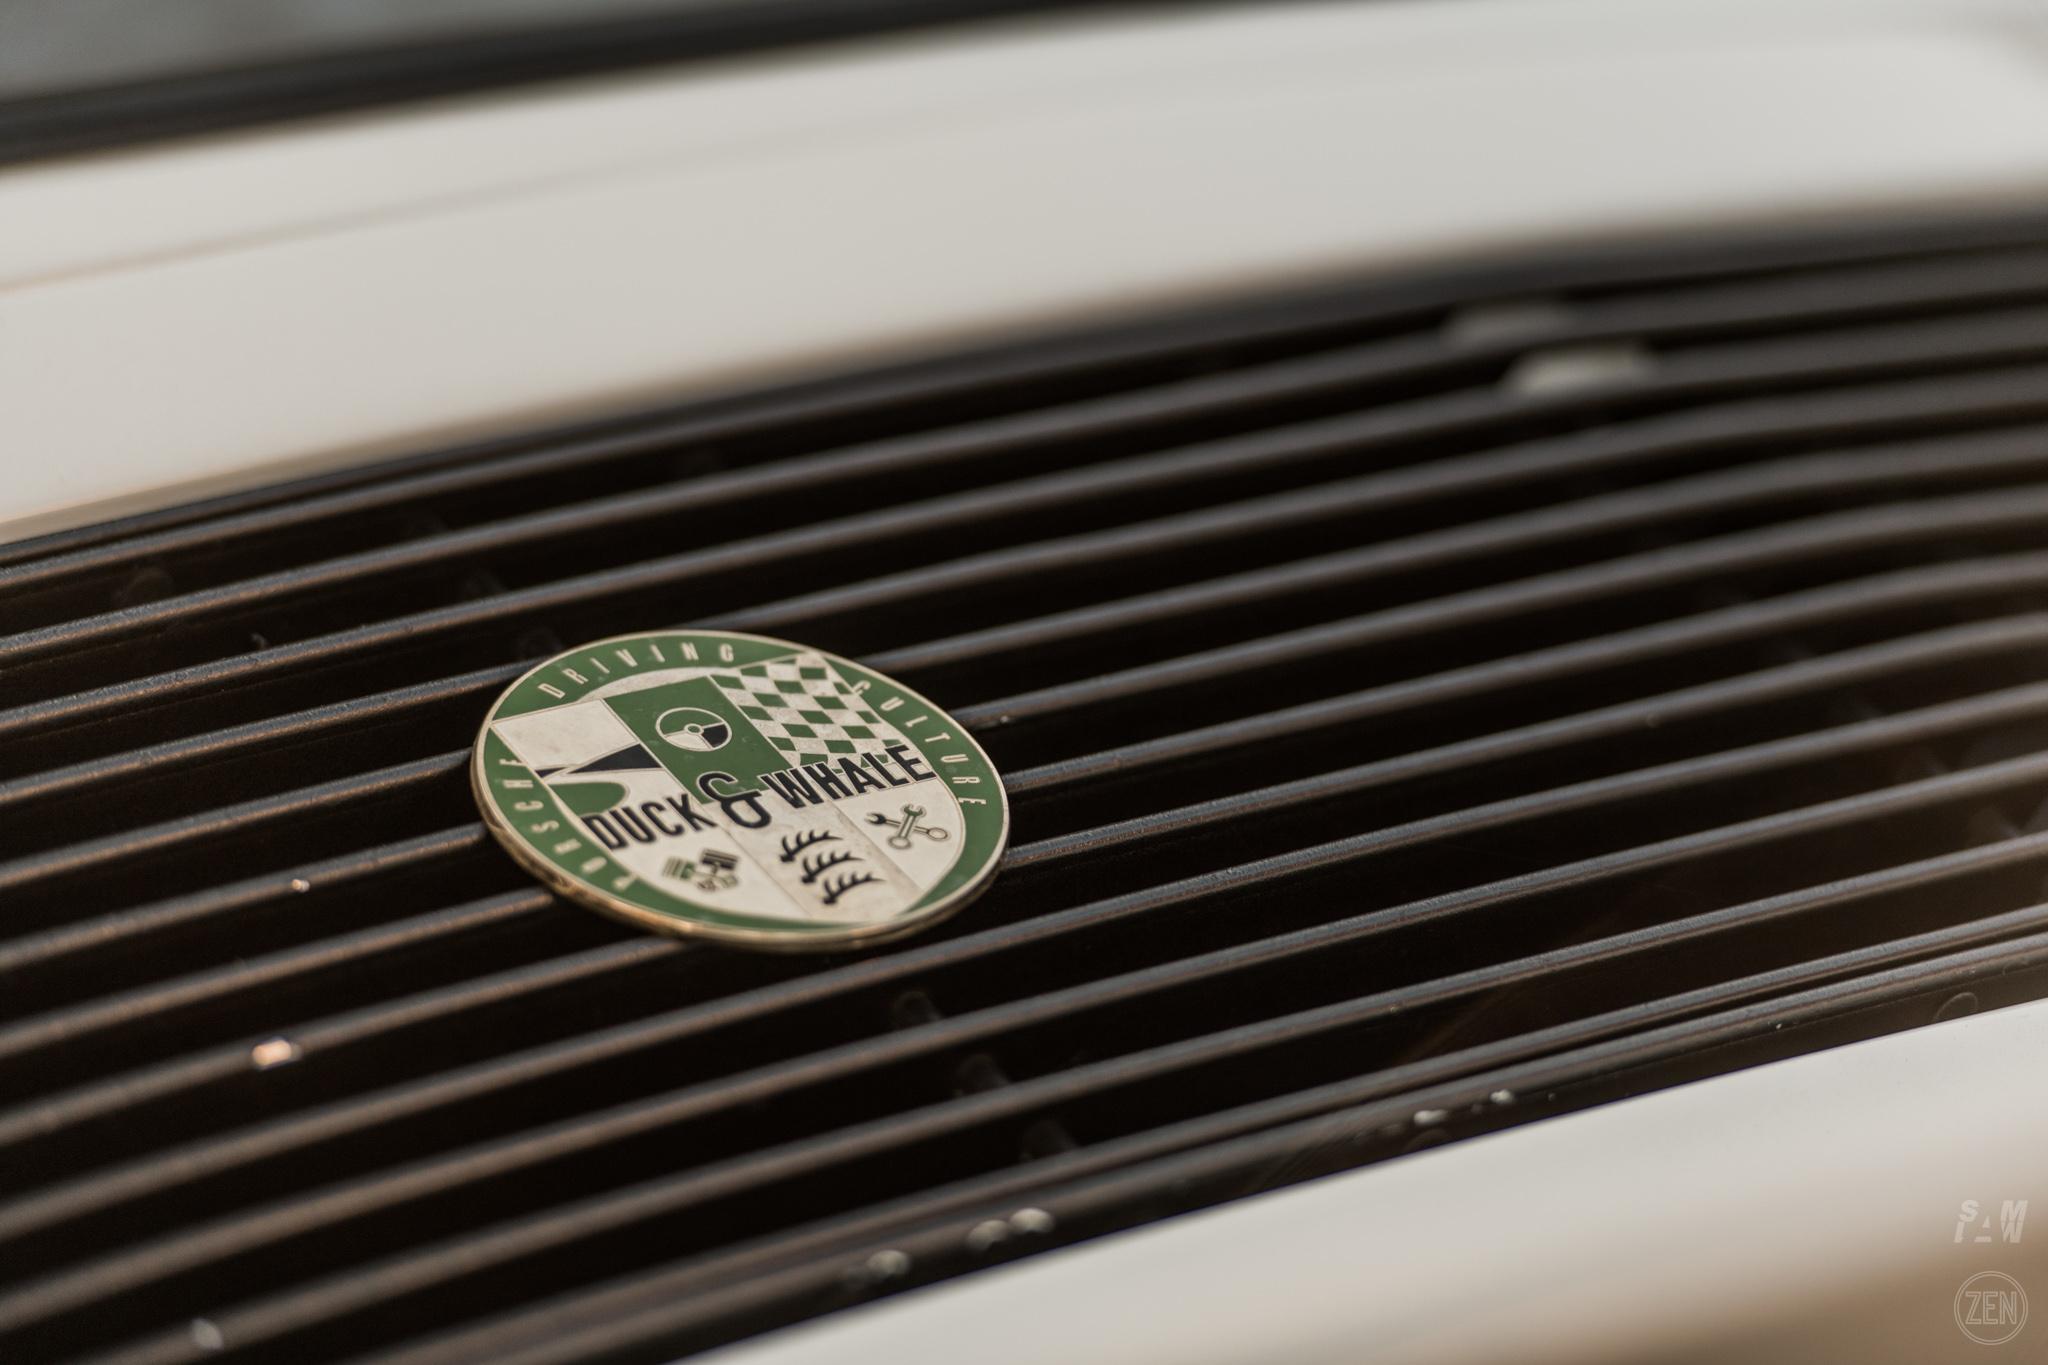 2019-10-27 - Autohaus Porsches & Coffee 062